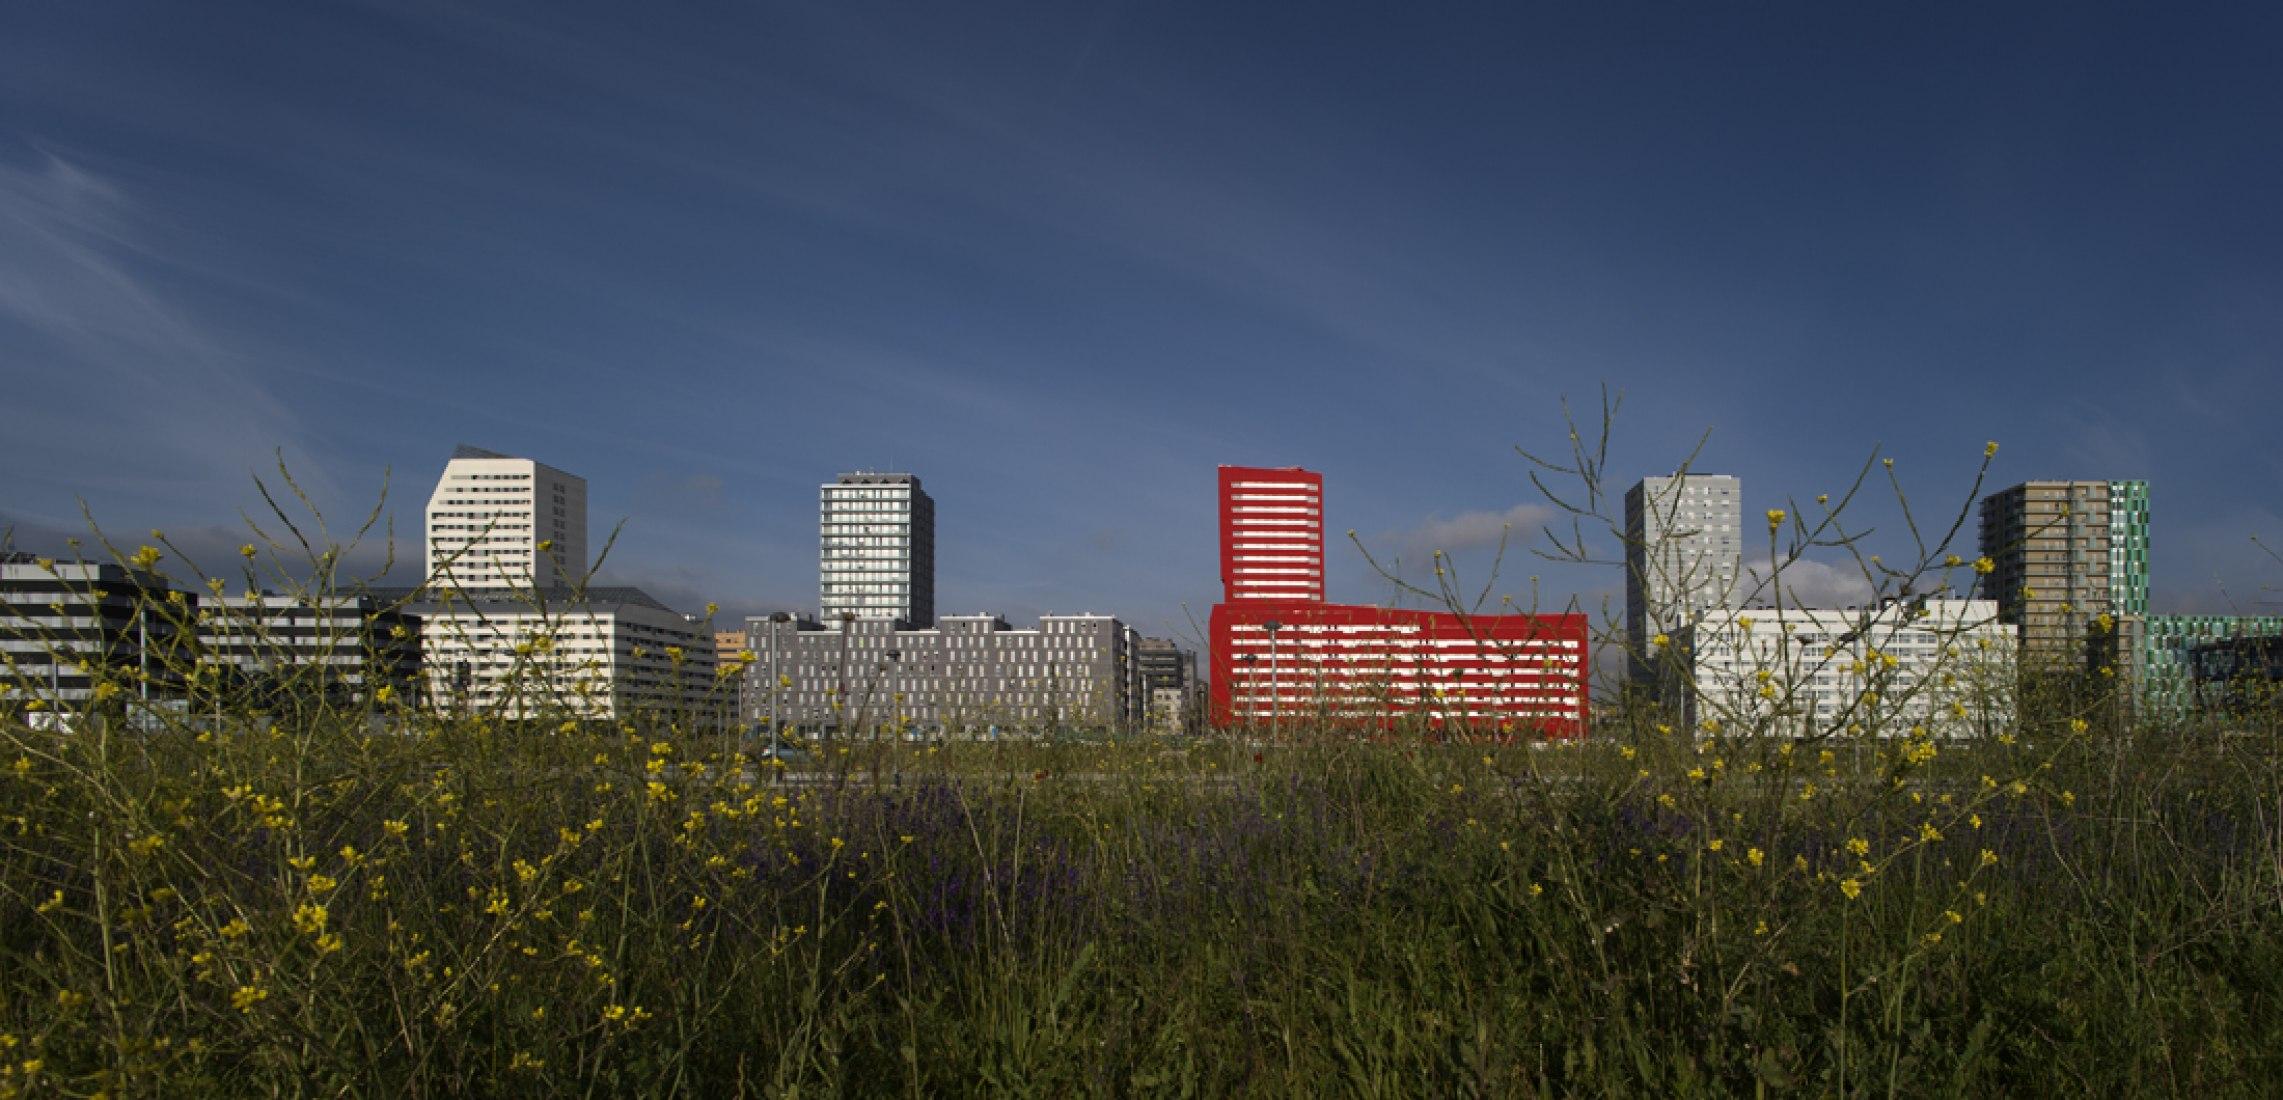 Vista del conjunto. 242 viviendas de protección ofcial por Iñaki Garai Zabala (ACXT Architects). Fotografía © Aitor Ortiz.